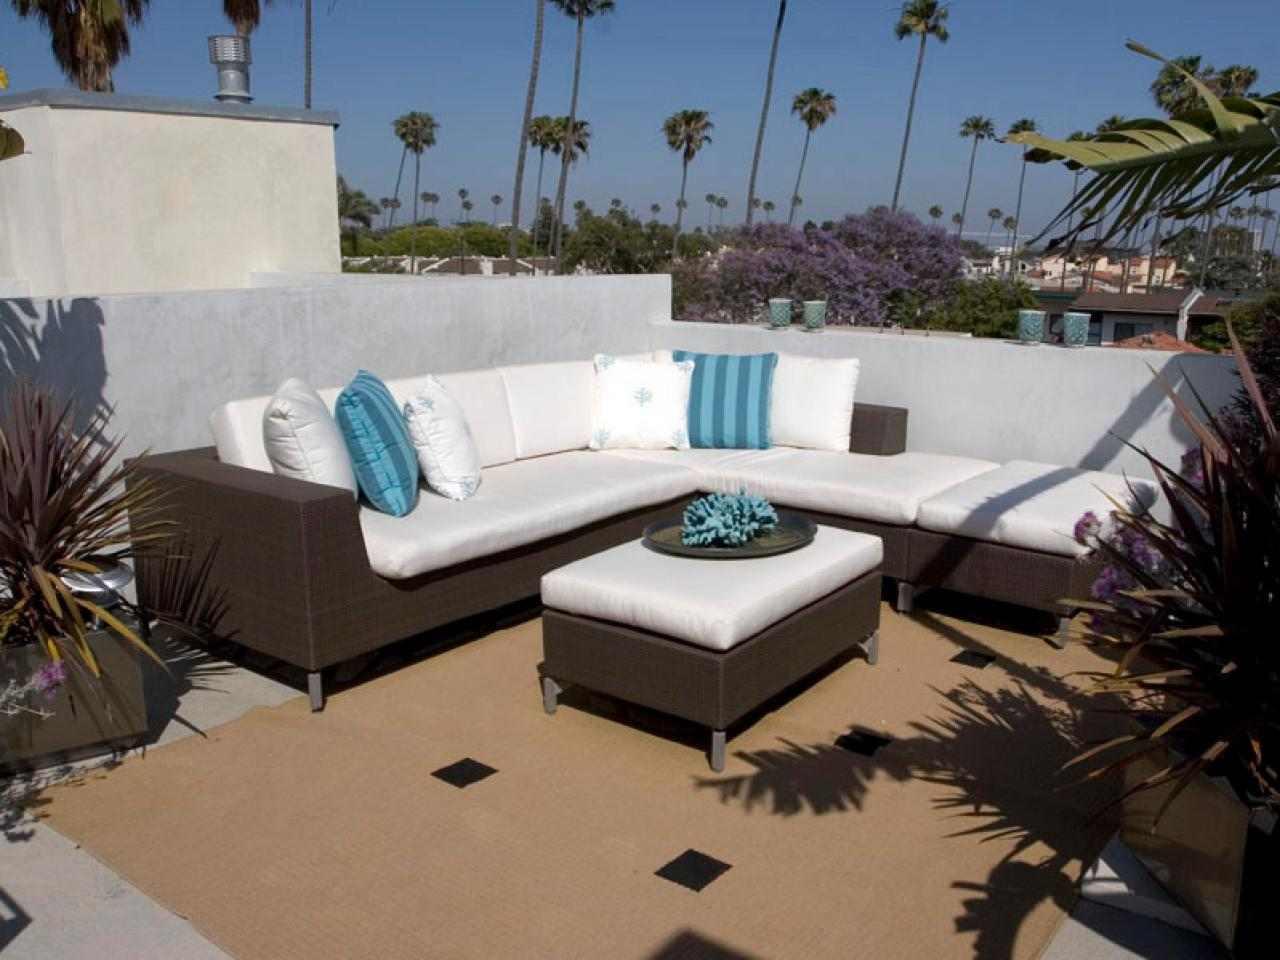 canape exterieur idee salon jardin minimaliste deniser pas cher bleu